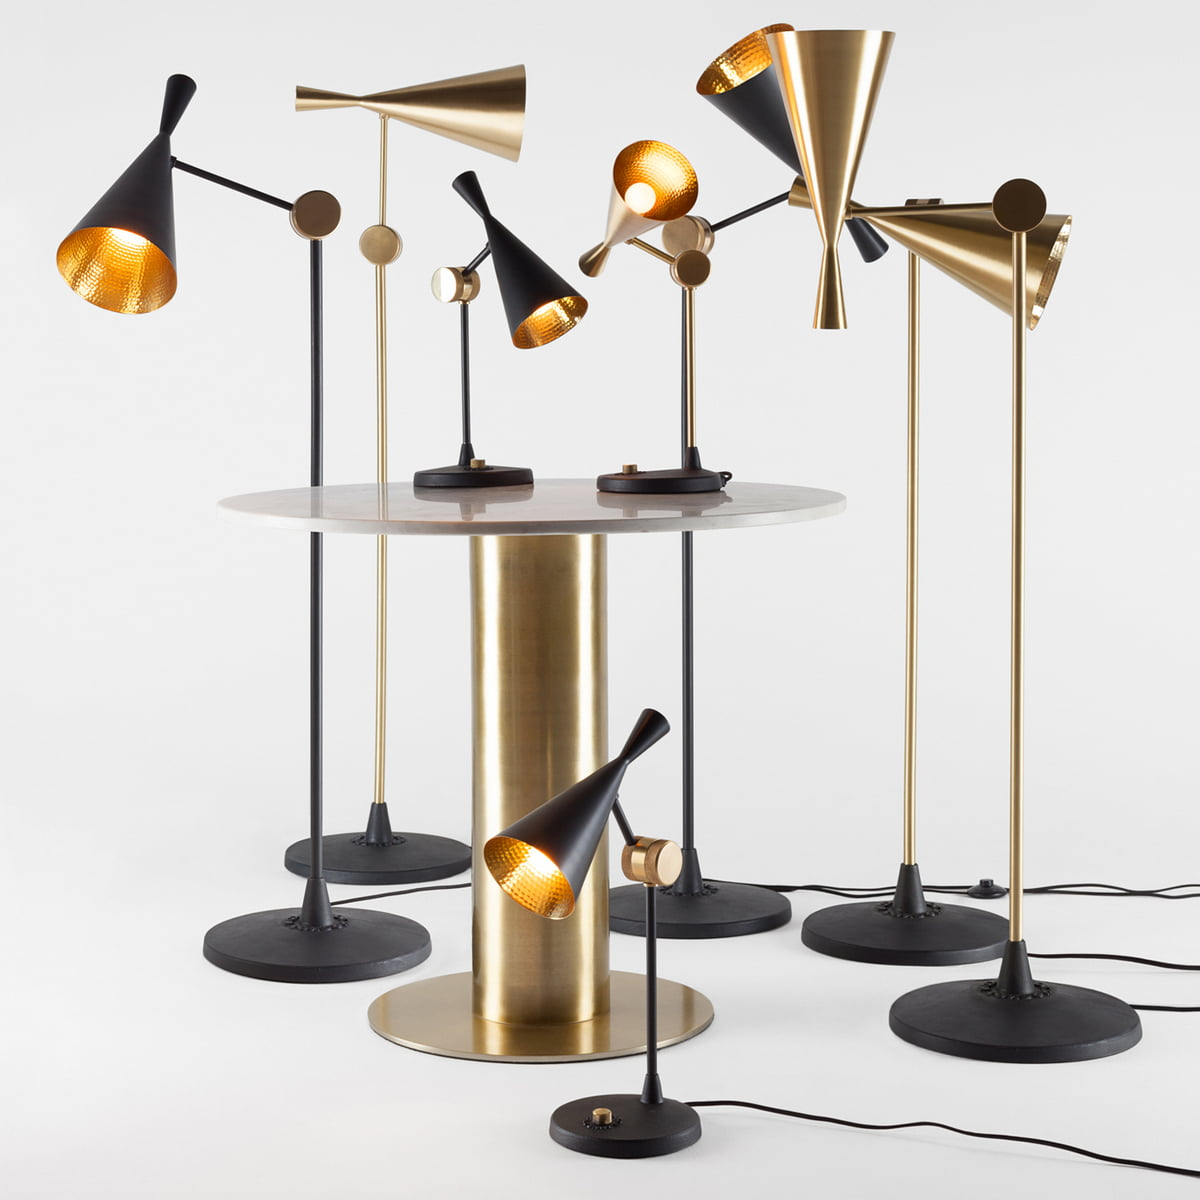 beat stehleuchte von tom dixon connox shop. Black Bedroom Furniture Sets. Home Design Ideas